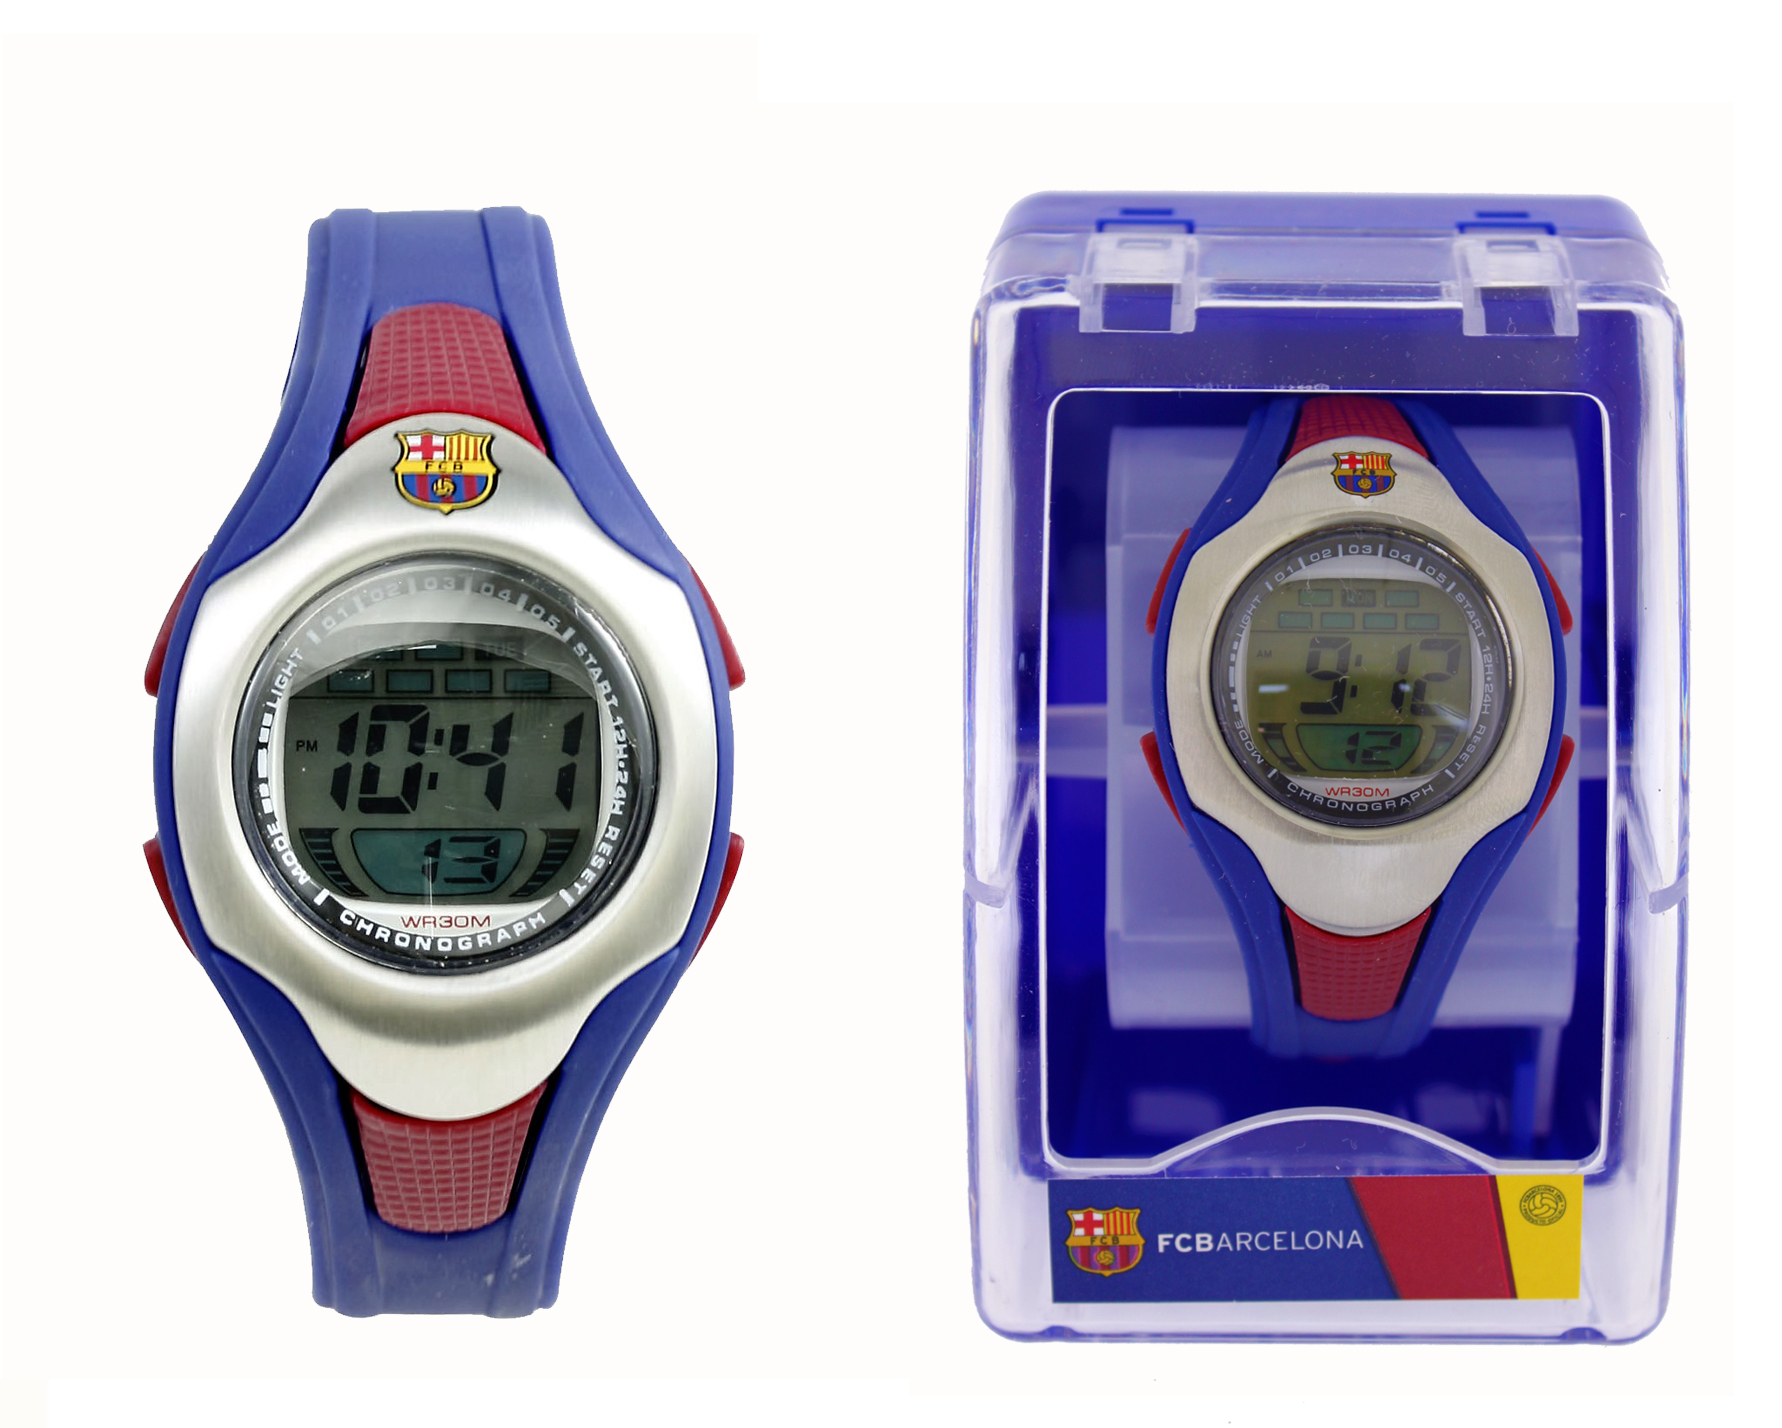 Reloj pulsera digital cadete Futbol Club Barcelona*